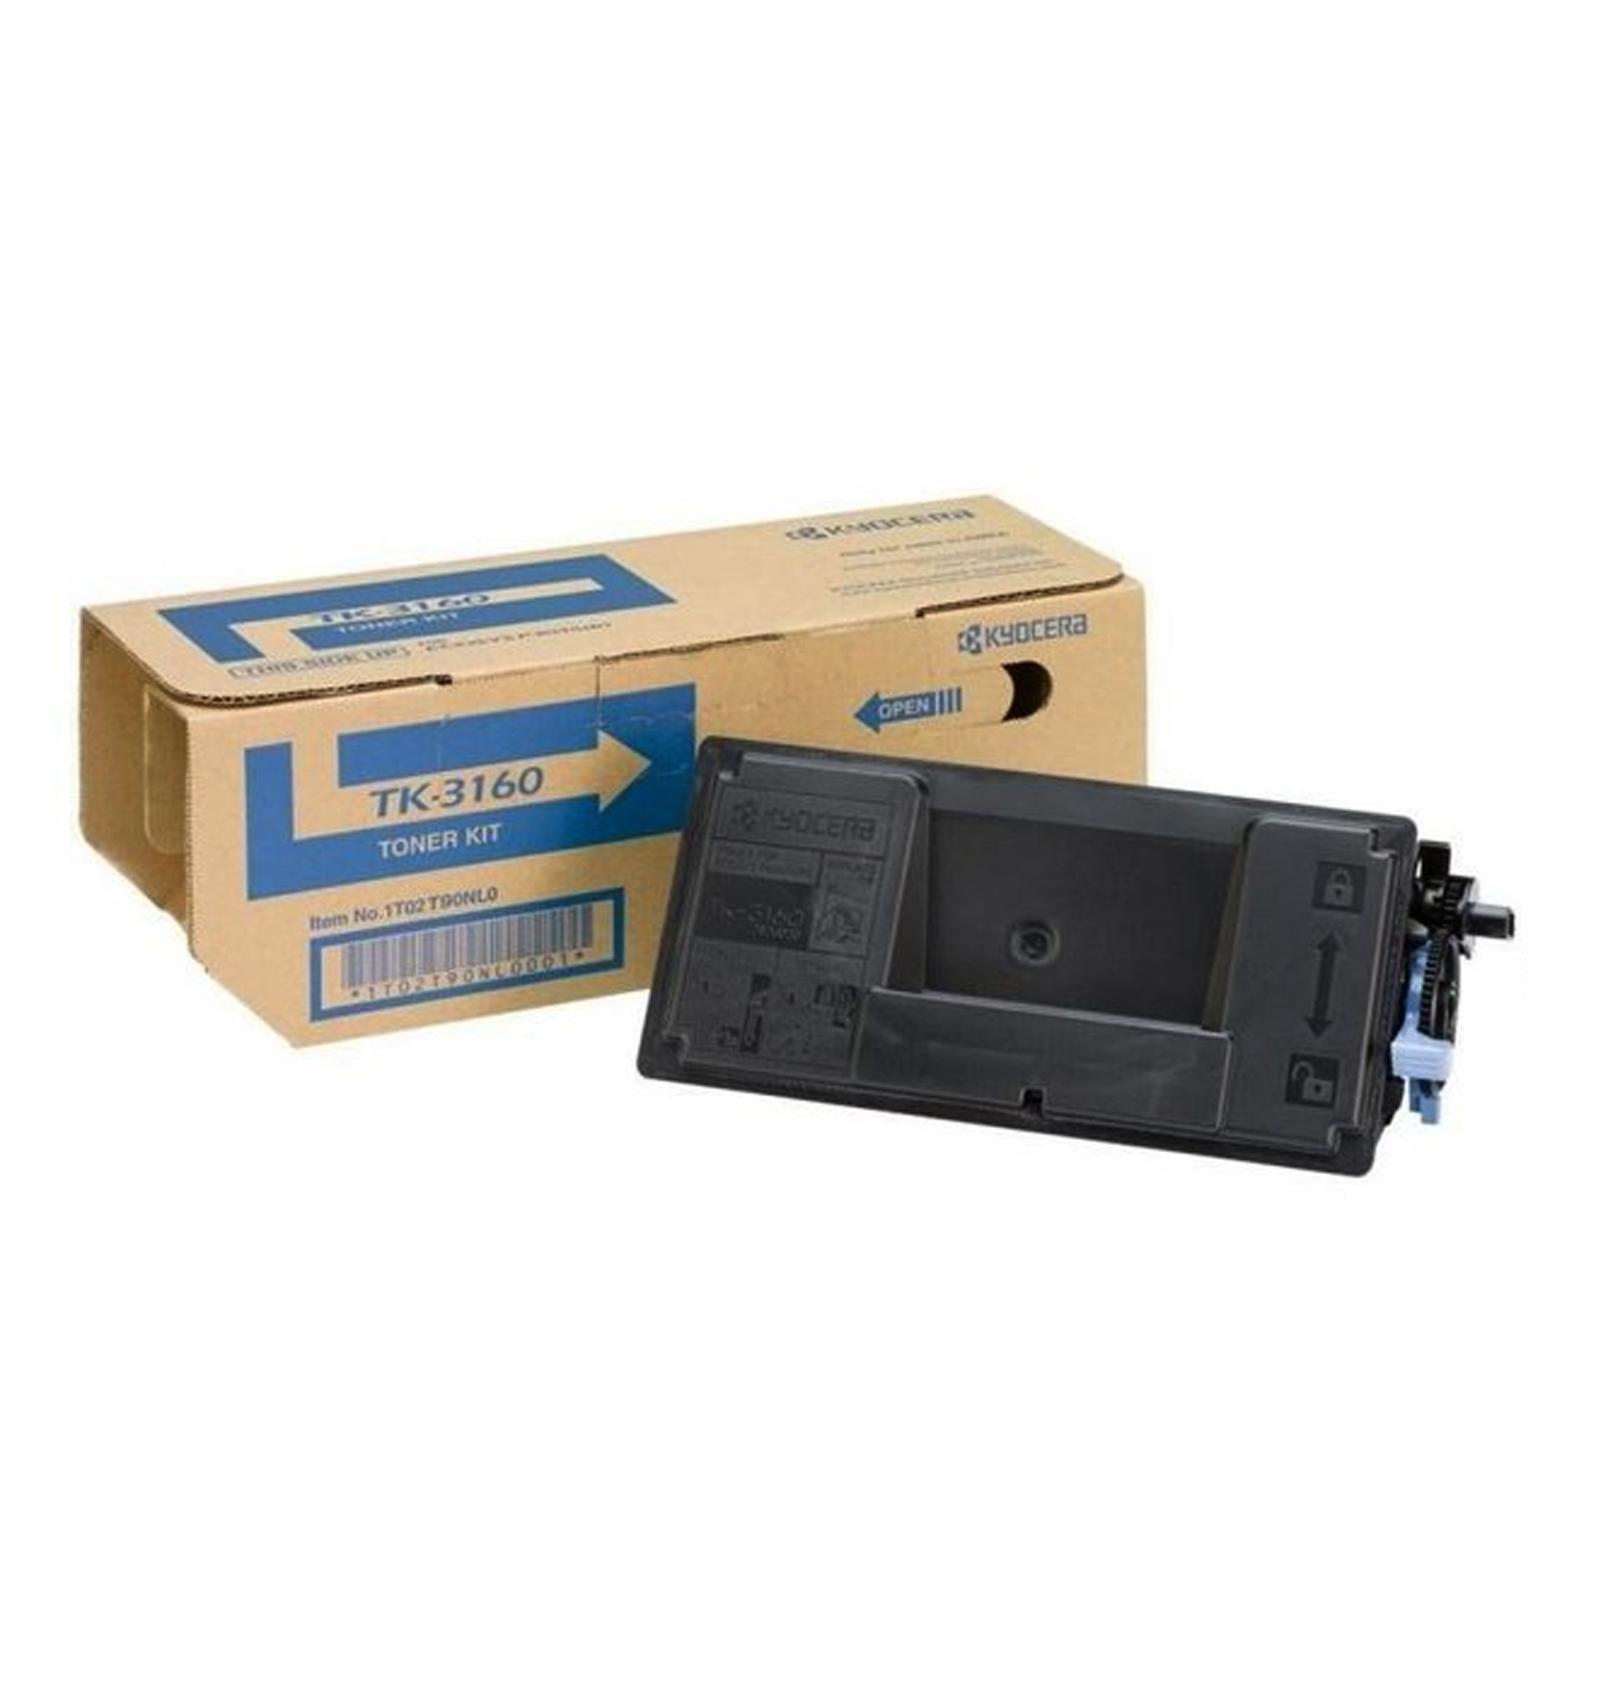 Kyocera TK-3160 для Kyocera P3055dn/P3060dn/P3045dn/P3050dn